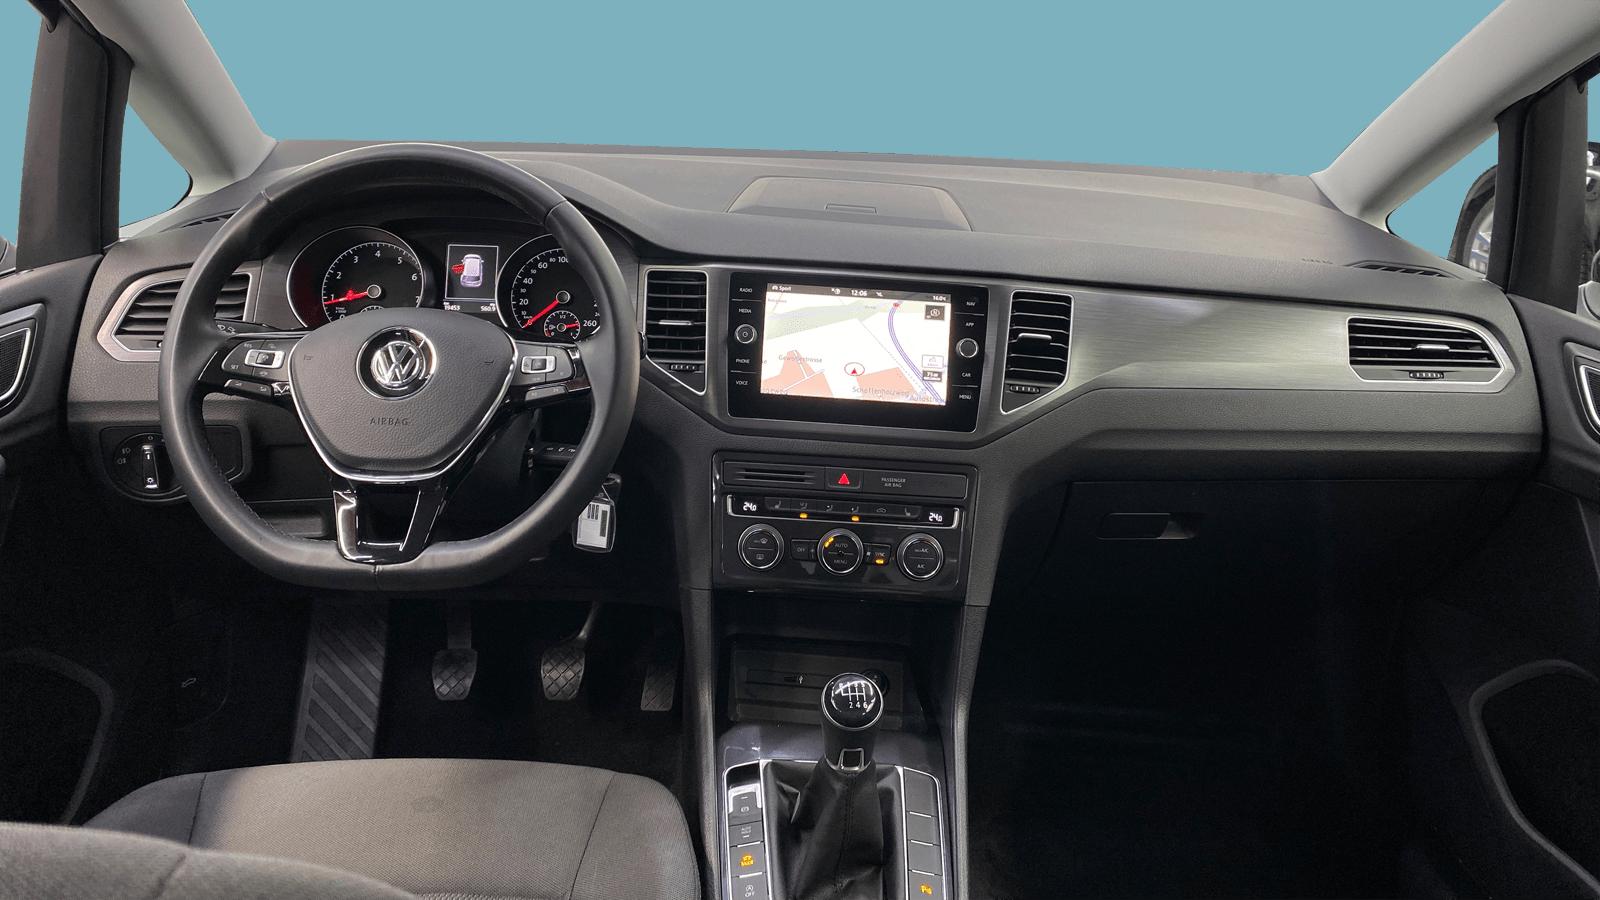 VW Golf Sportsvan Black interior - Clyde car subscription